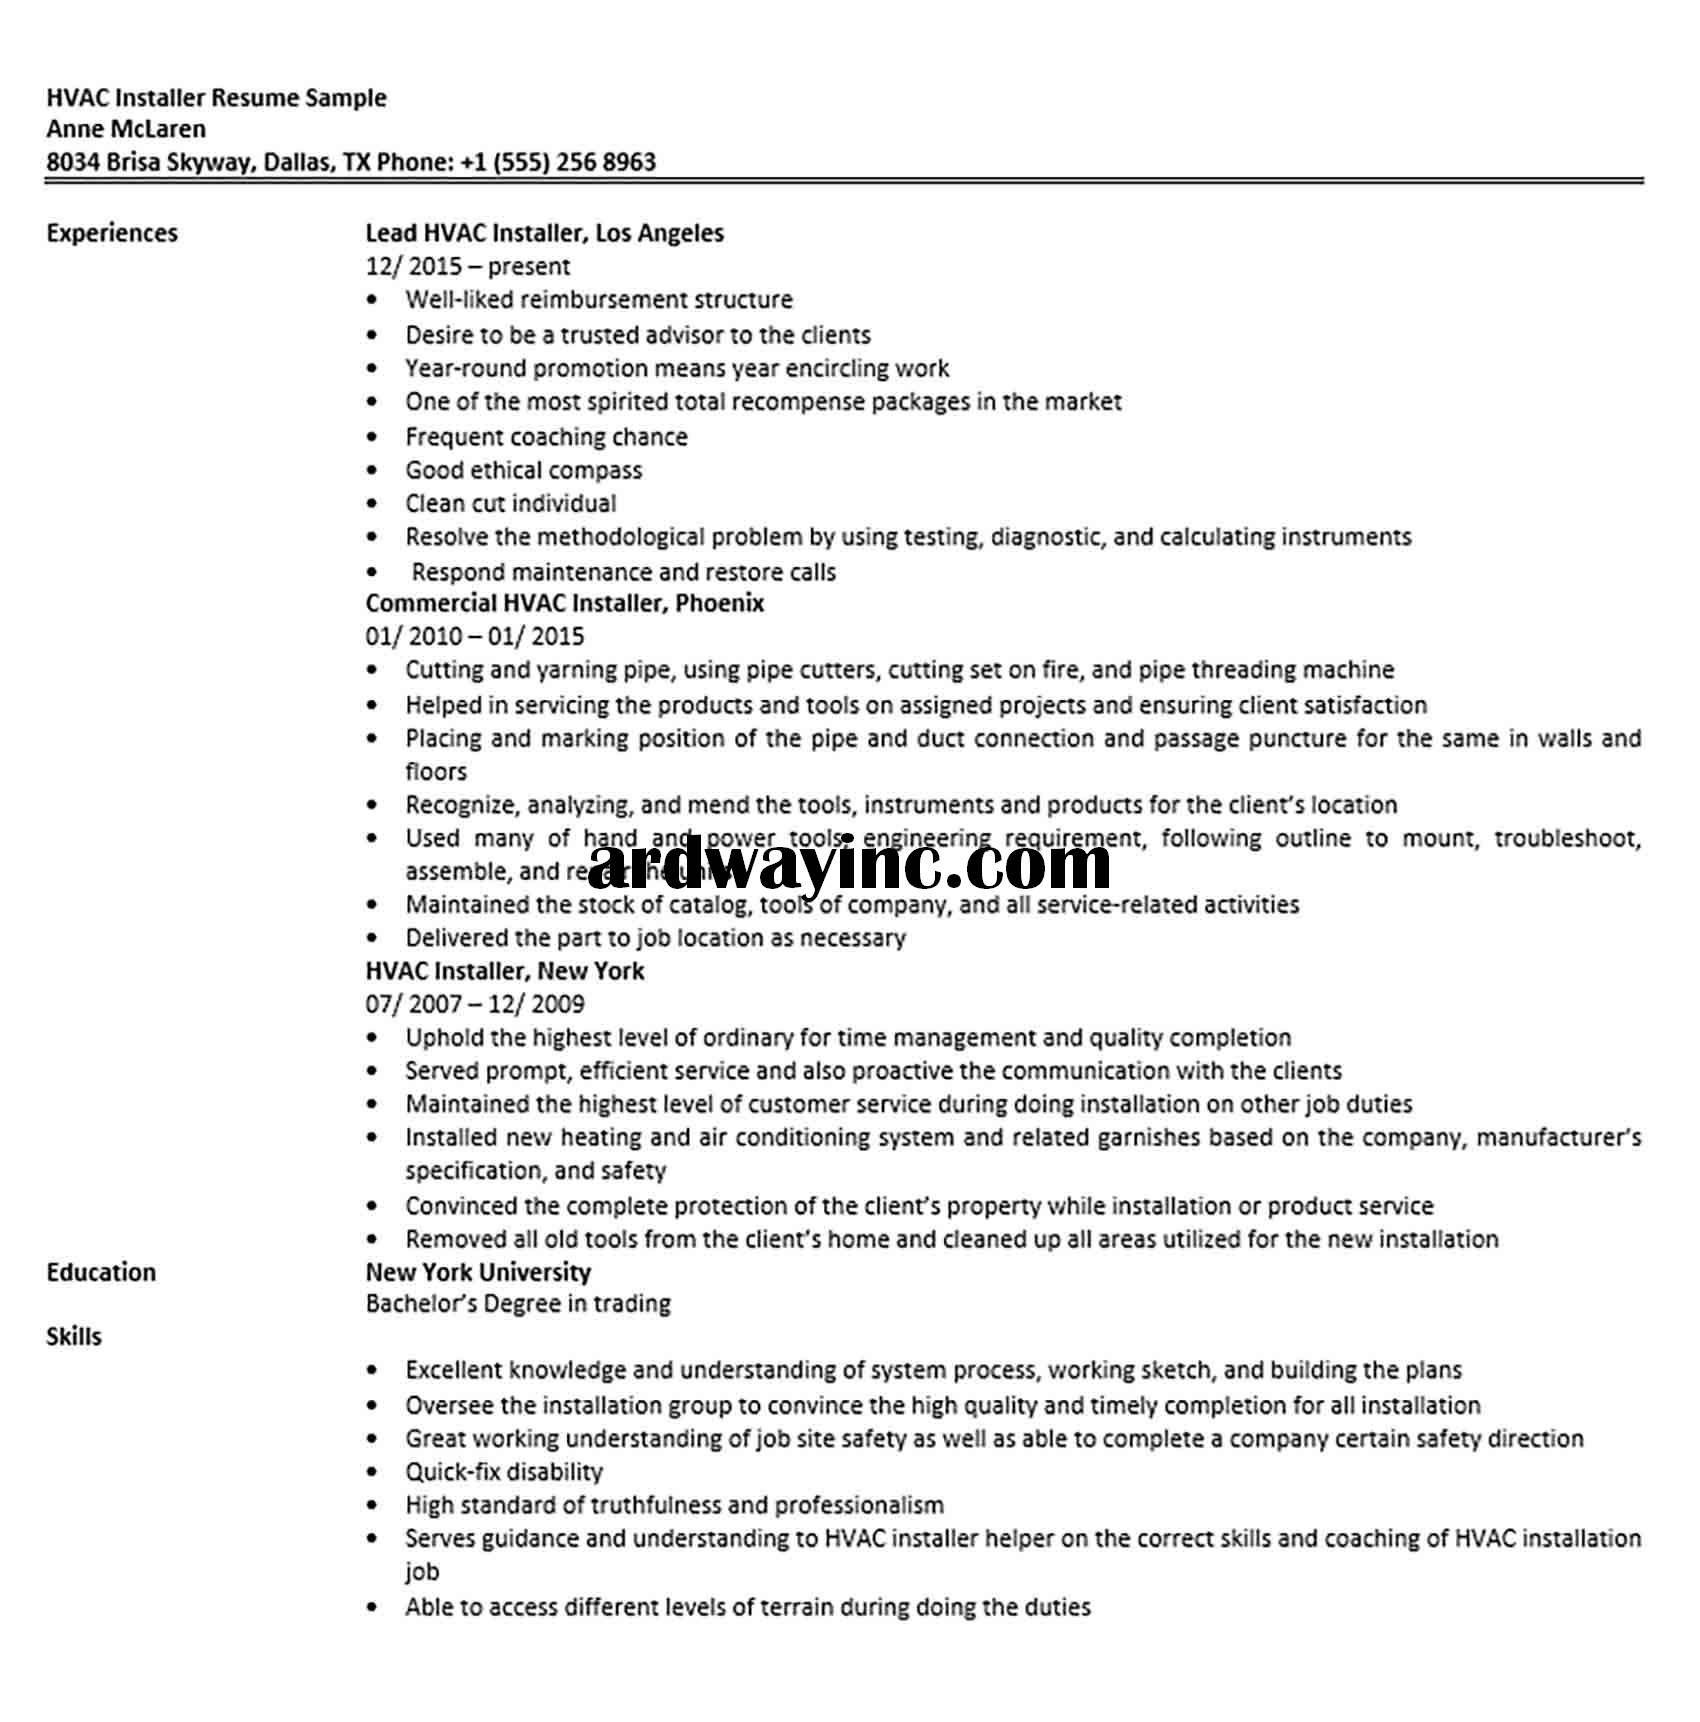 HVAC Installer Resume Sample in 2020 Hvac installation